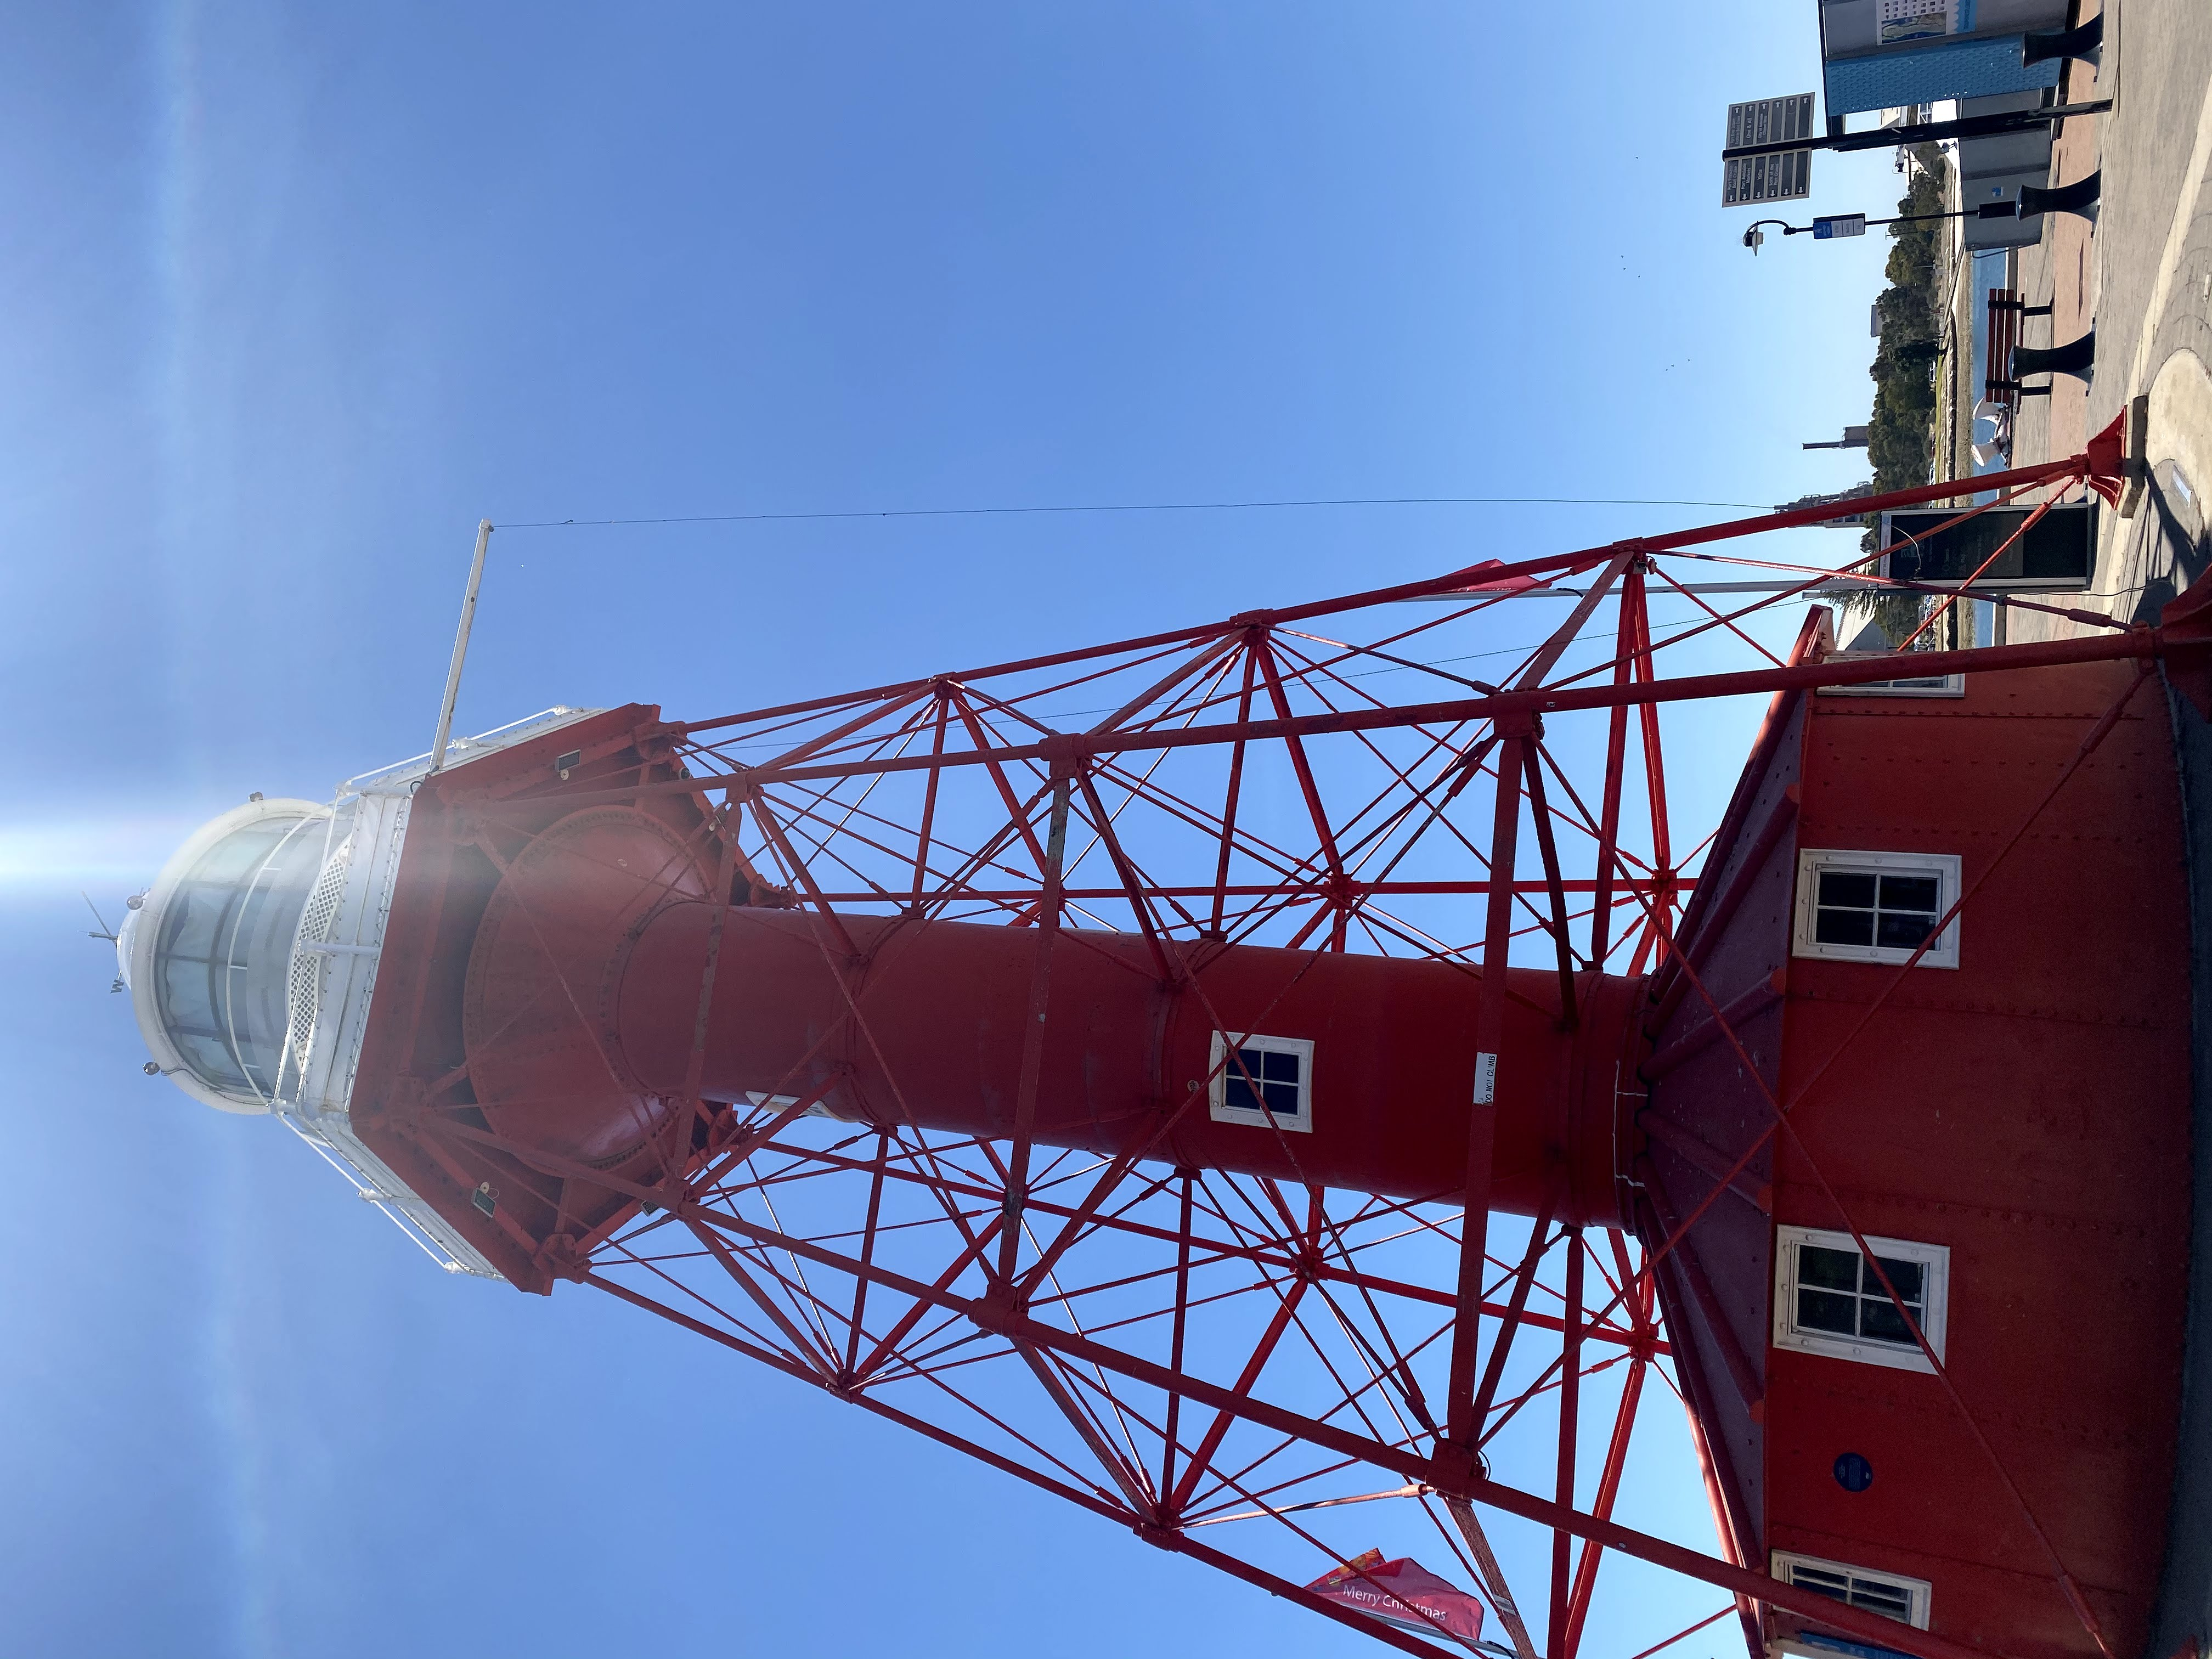 Lighthouse in Port Adelaide